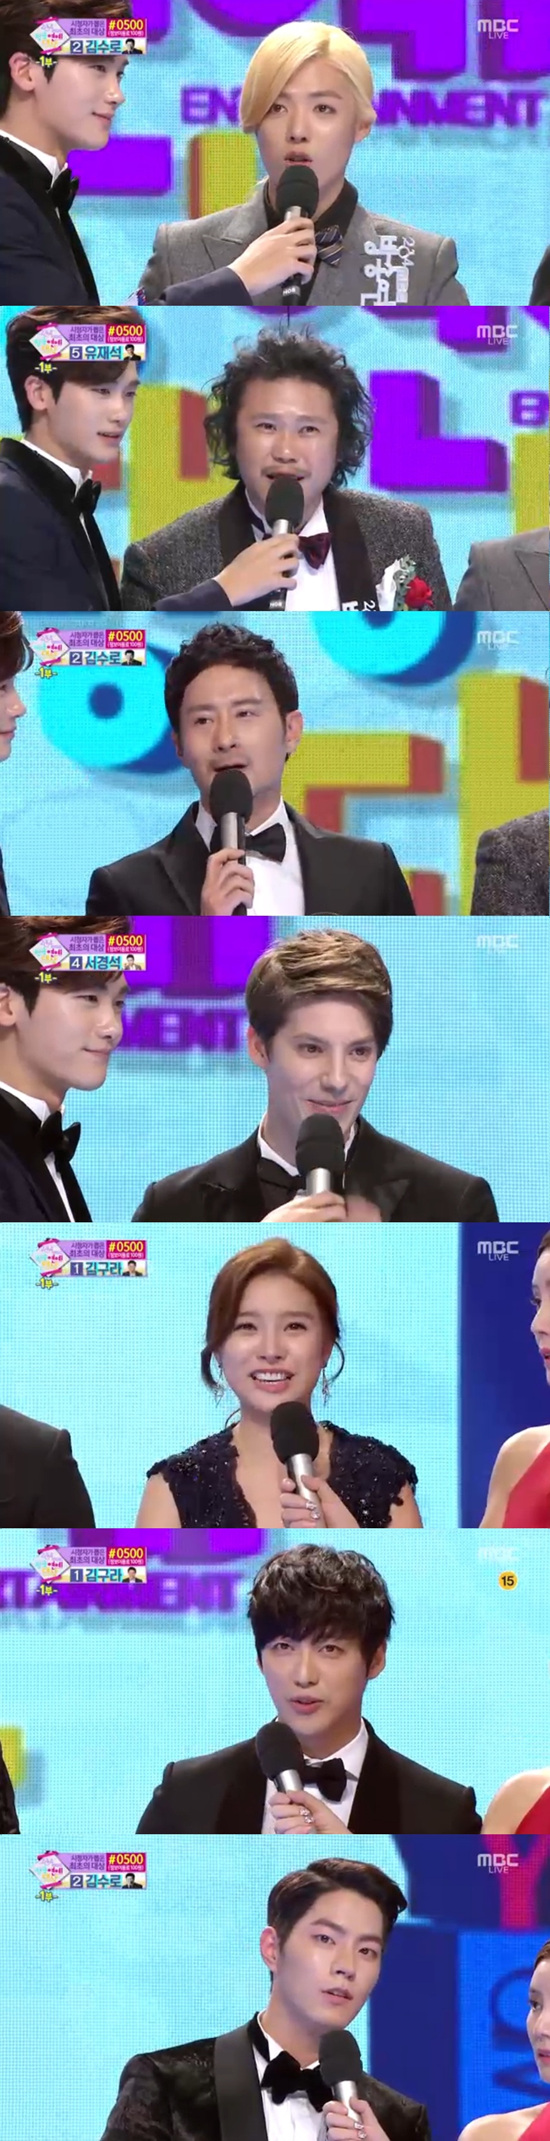 'MBC 방송연예대상' ⓒ MBC 방송화면